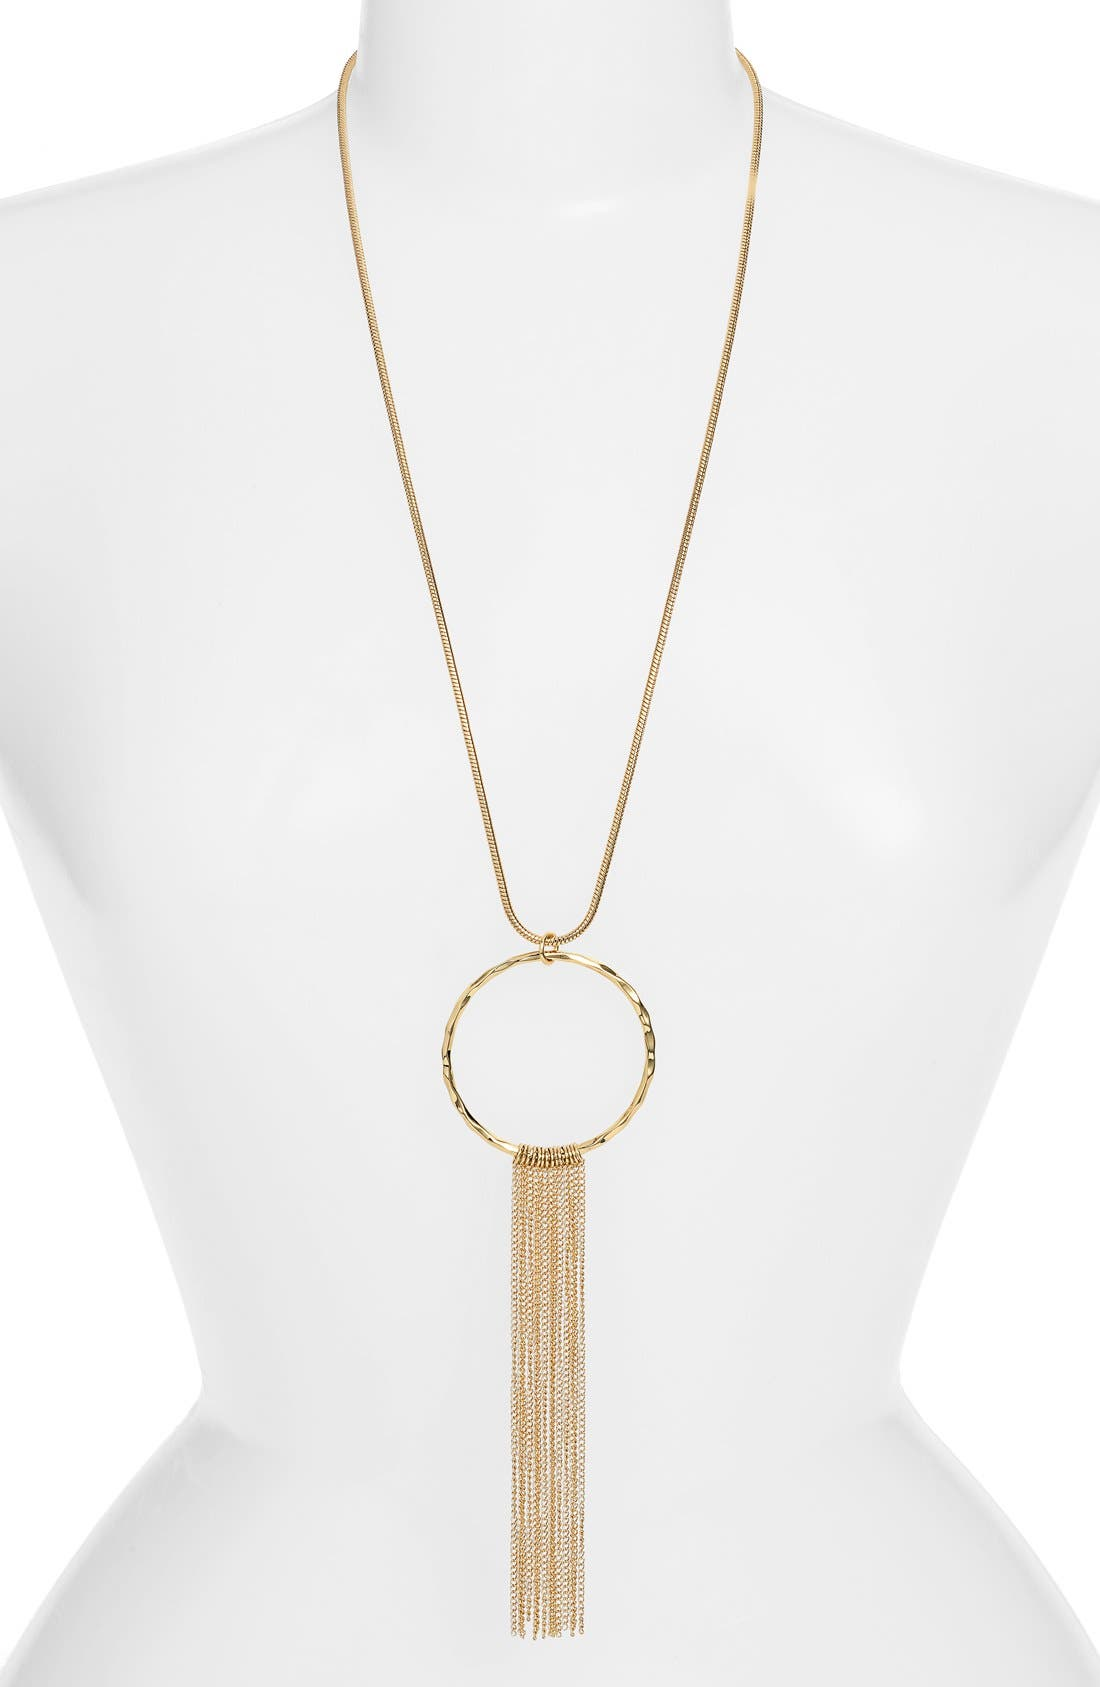 Main Image - Jules Smith 'Oslo' Tassel Pendant Necklace